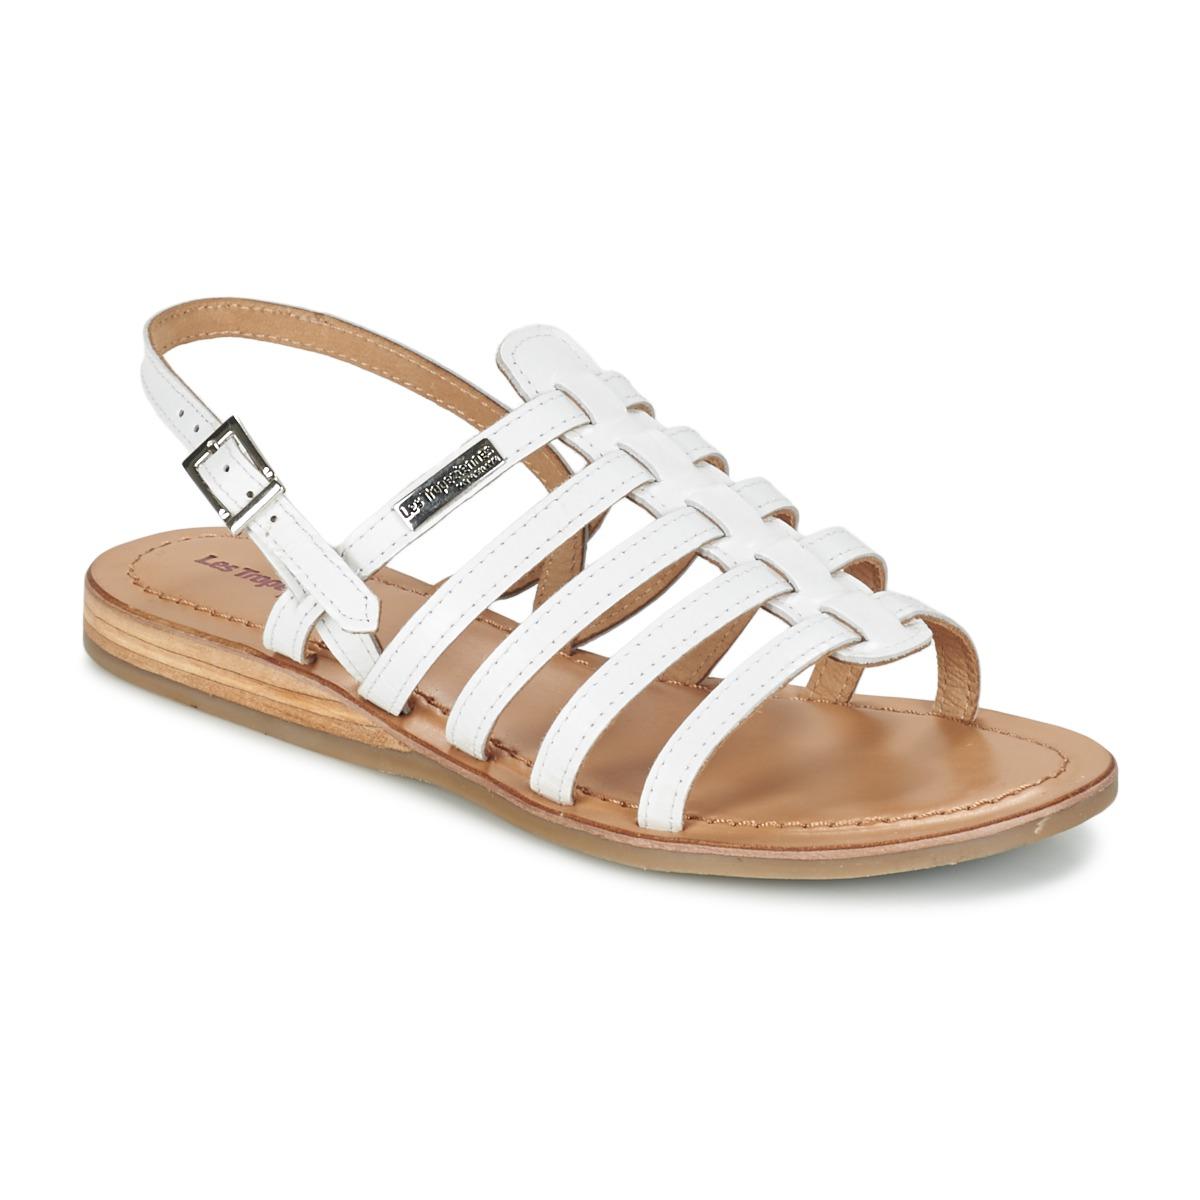 Les Tropéziennes par M Belarbi HAVAPO Weiss - Kostenloser Versand bei Spartoode ! - Schuhe Sandalen / Sandaletten Damen 44,00 €